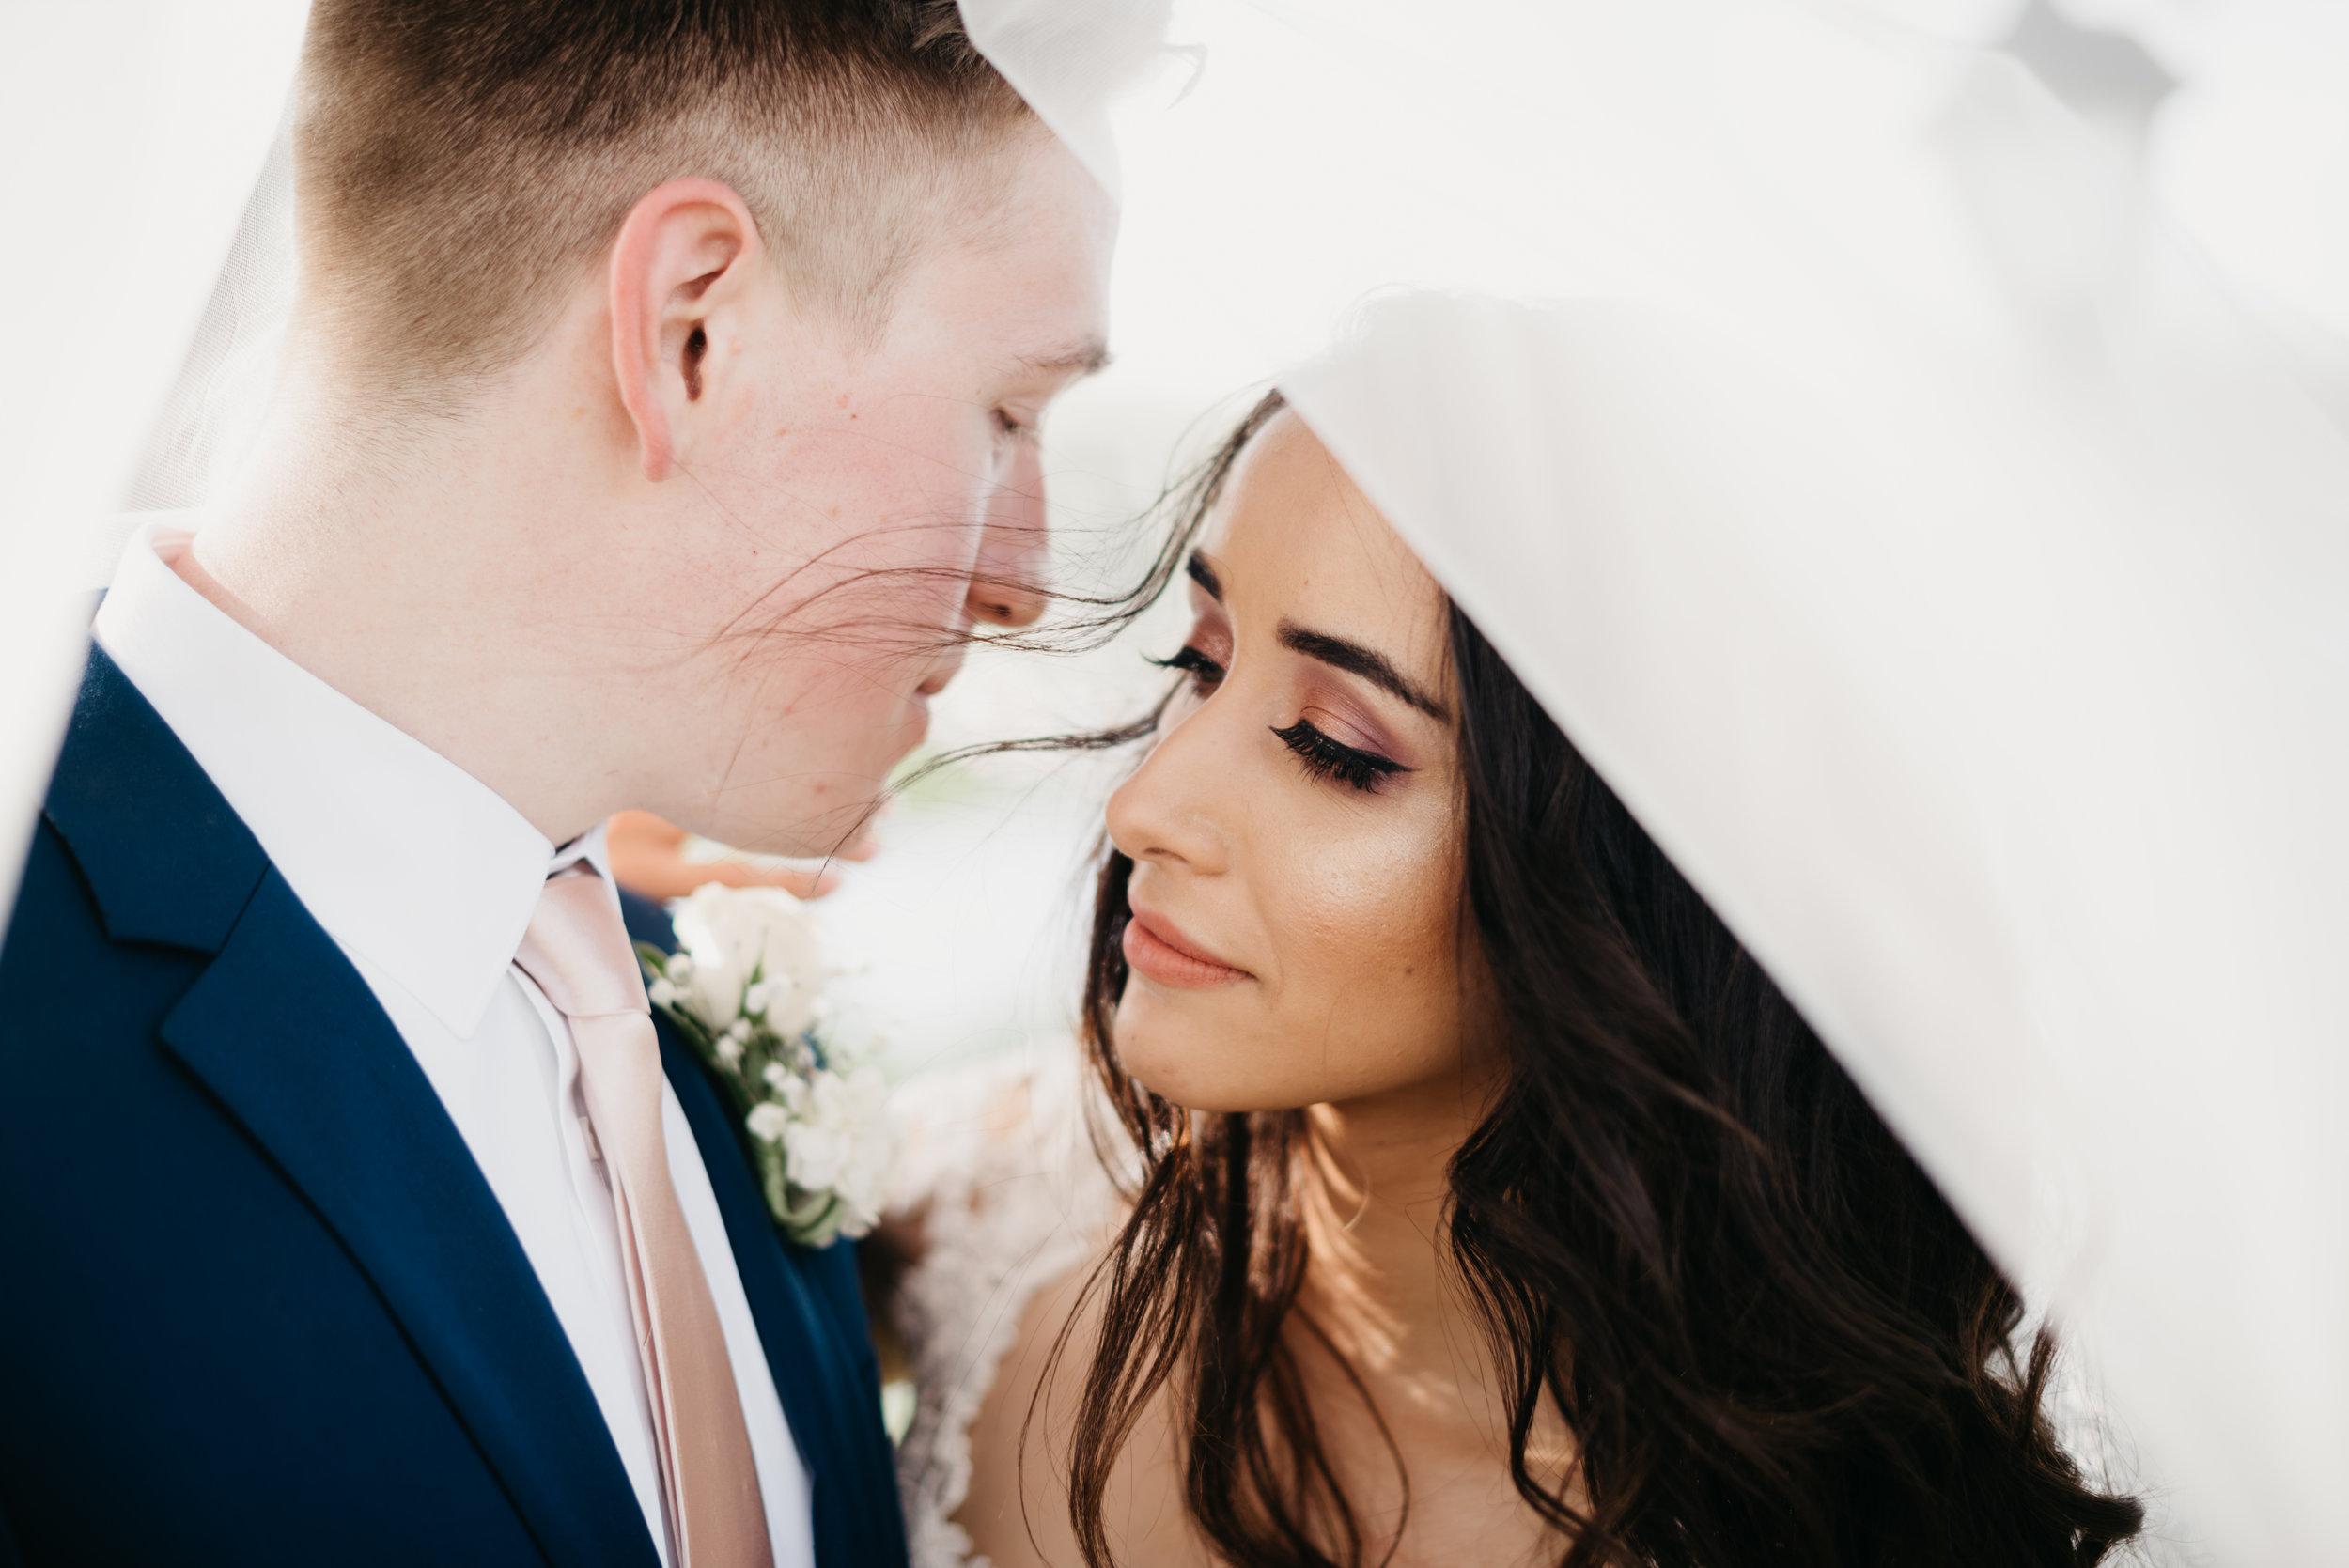 Barch-Massachusetts-Lakeside Tent Wedding-Western Massachusetts Wedding Photographer-01637.jpg